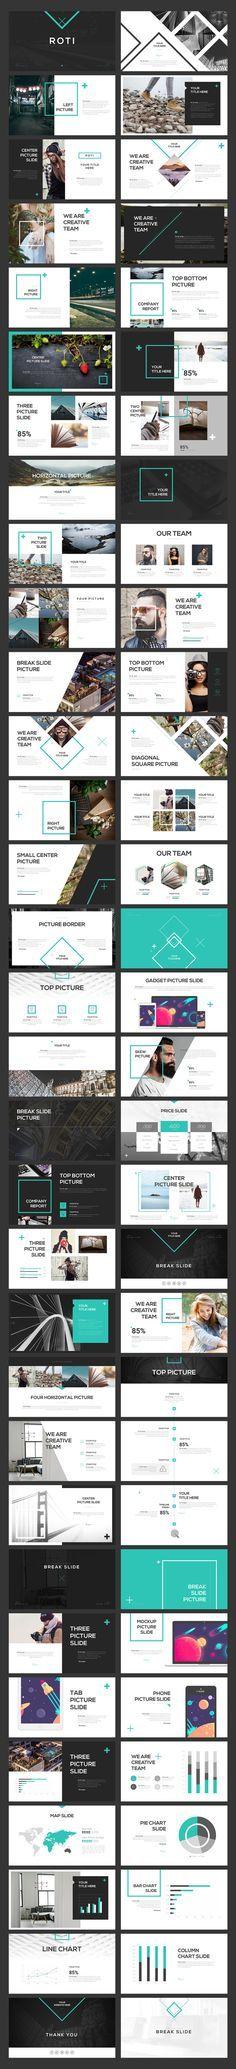 ROTI PowerPoint Template - Presentations - 6                                                                                                                                                                                 Mais